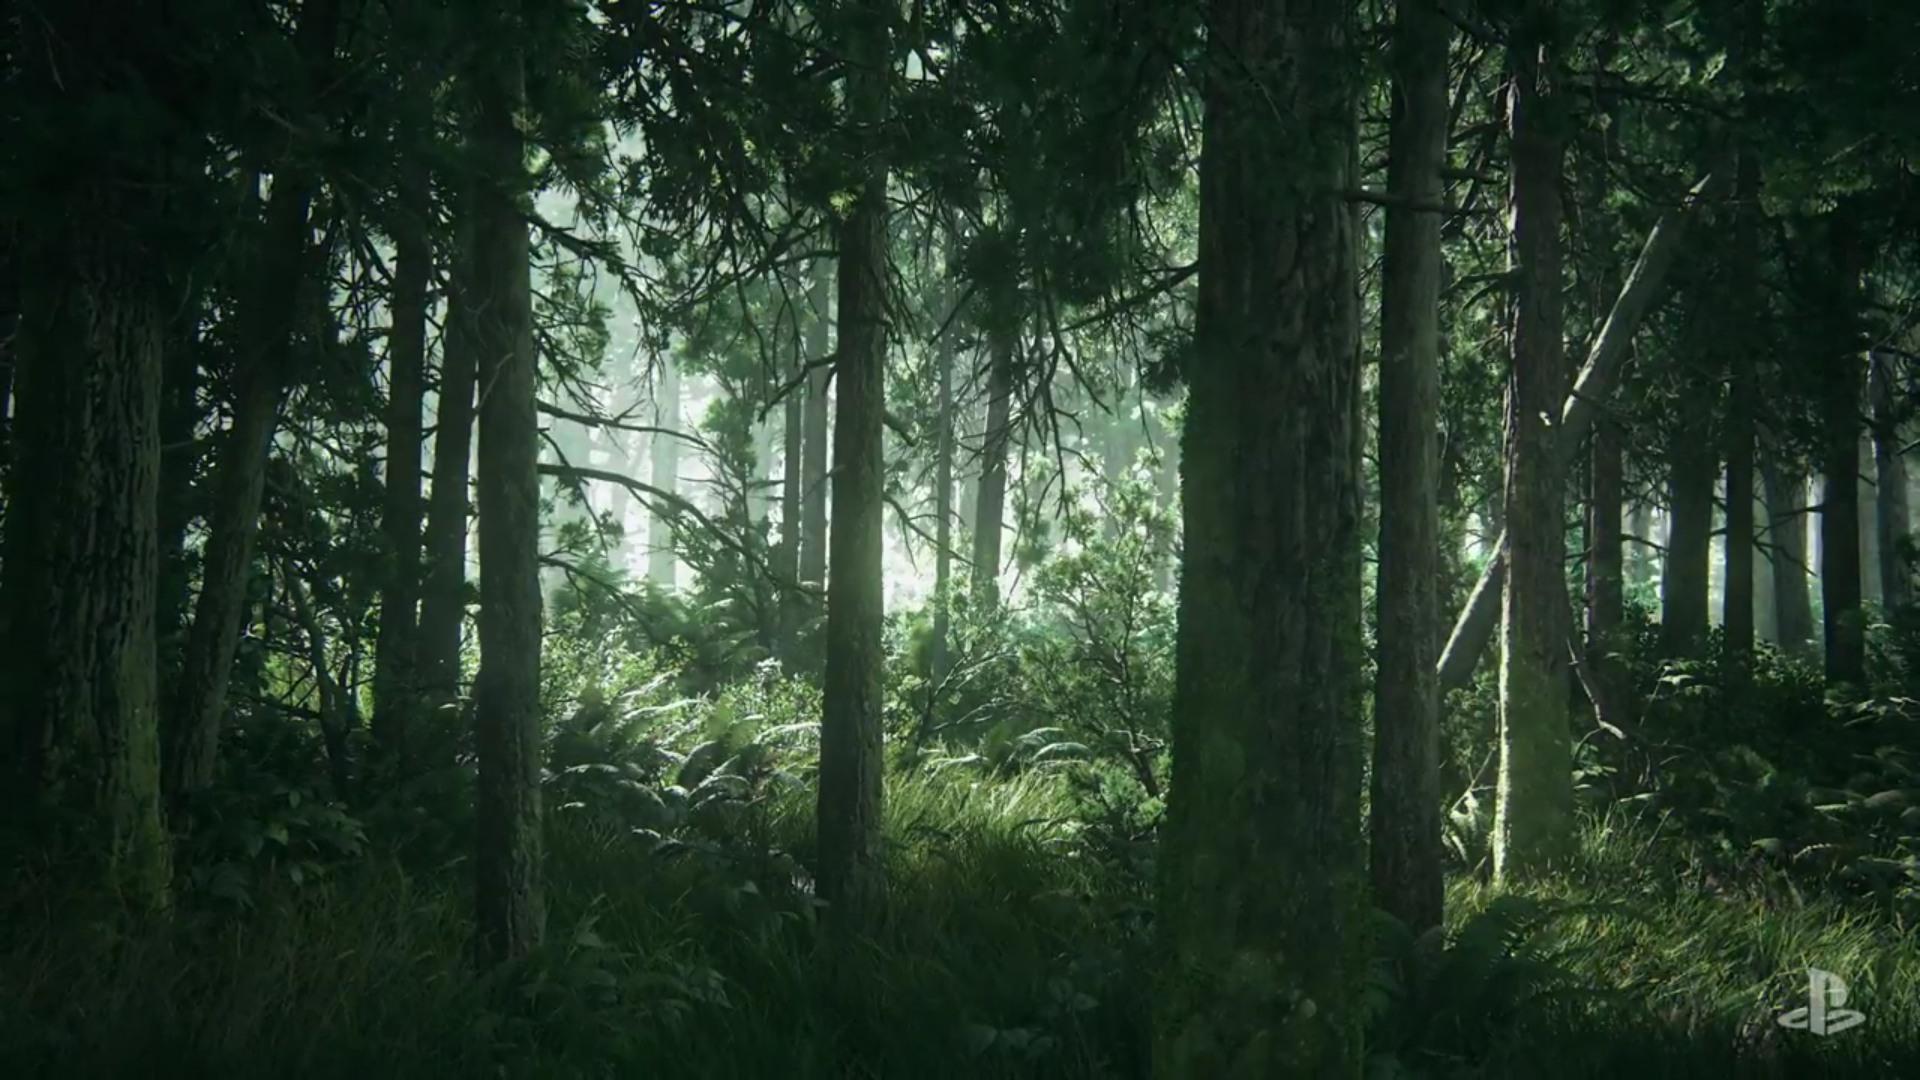 The Last Of Us Part Ii Hd Wallpaper Hd - Background The Last Of Us 2 , HD Wallpaper & Backgrounds